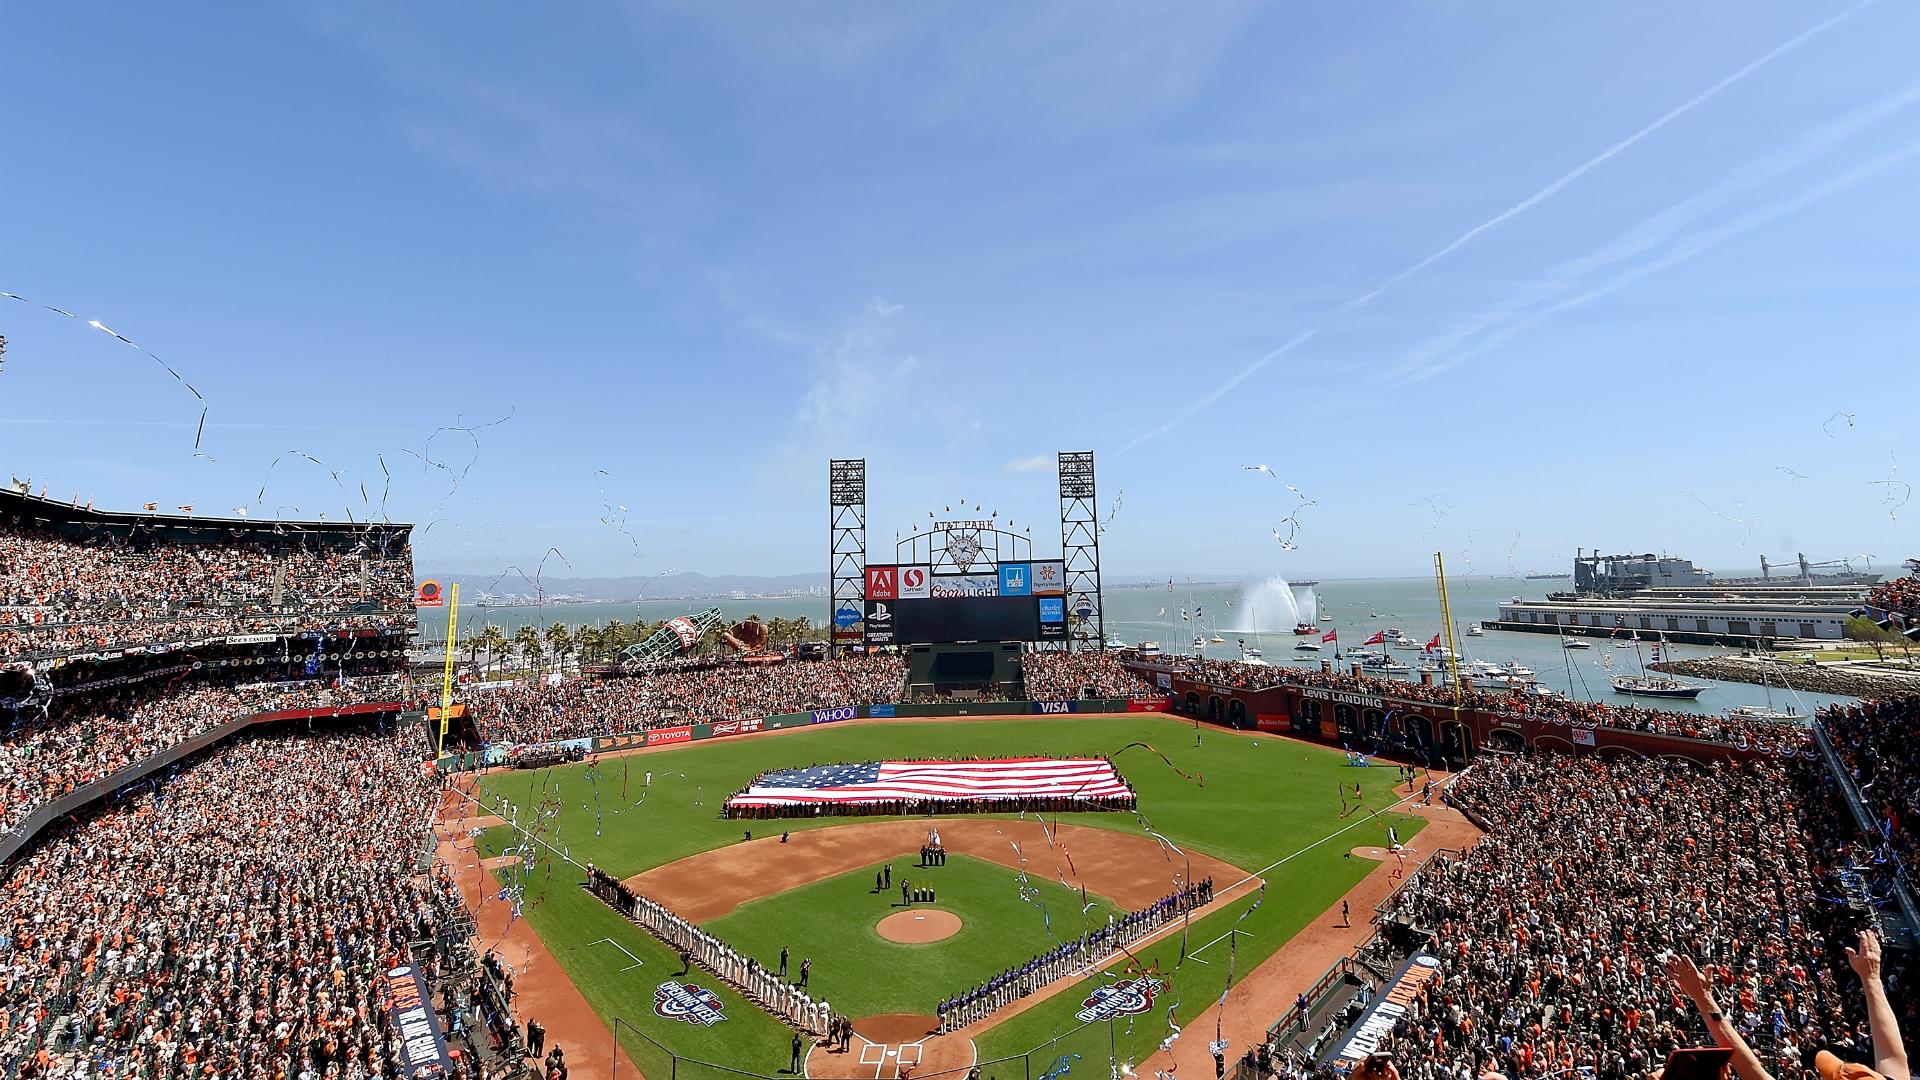 Baseball-42015-us-news-getty-ftr_1xm6kn4ai7ud71apbi60sbvgvd